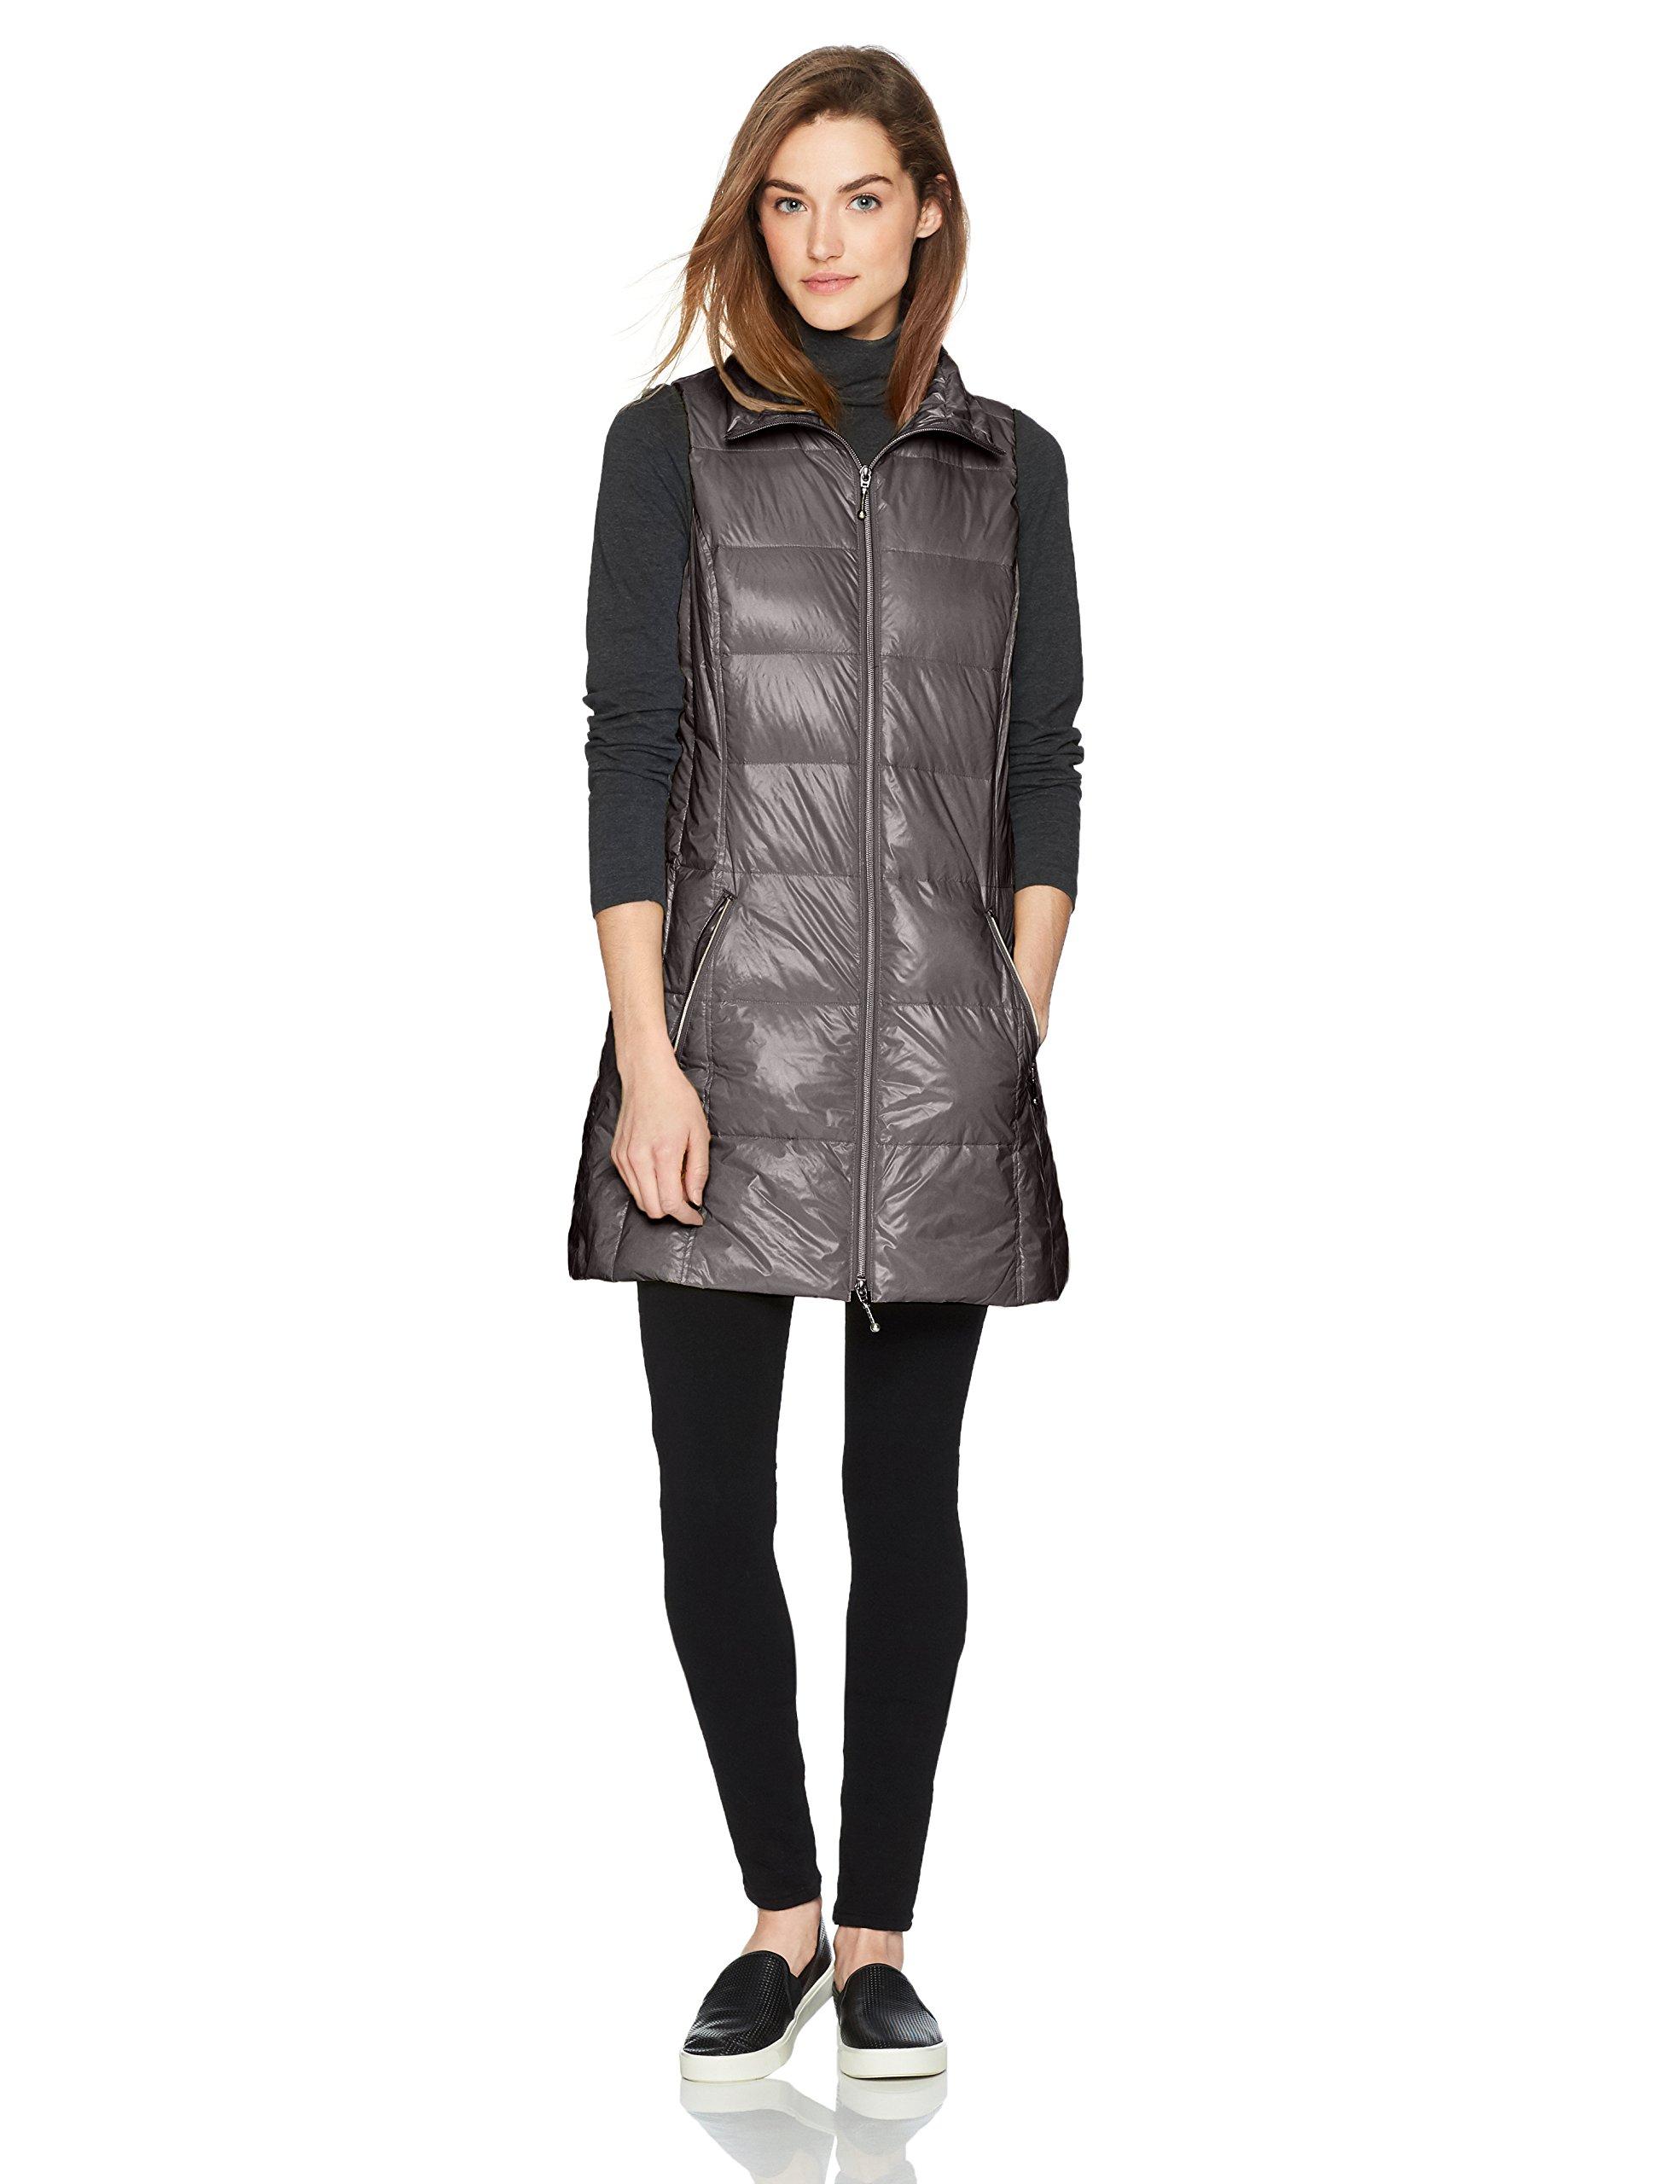 Coatology Women's Classic Long Down Vest, Charcoal, XS by Coatology